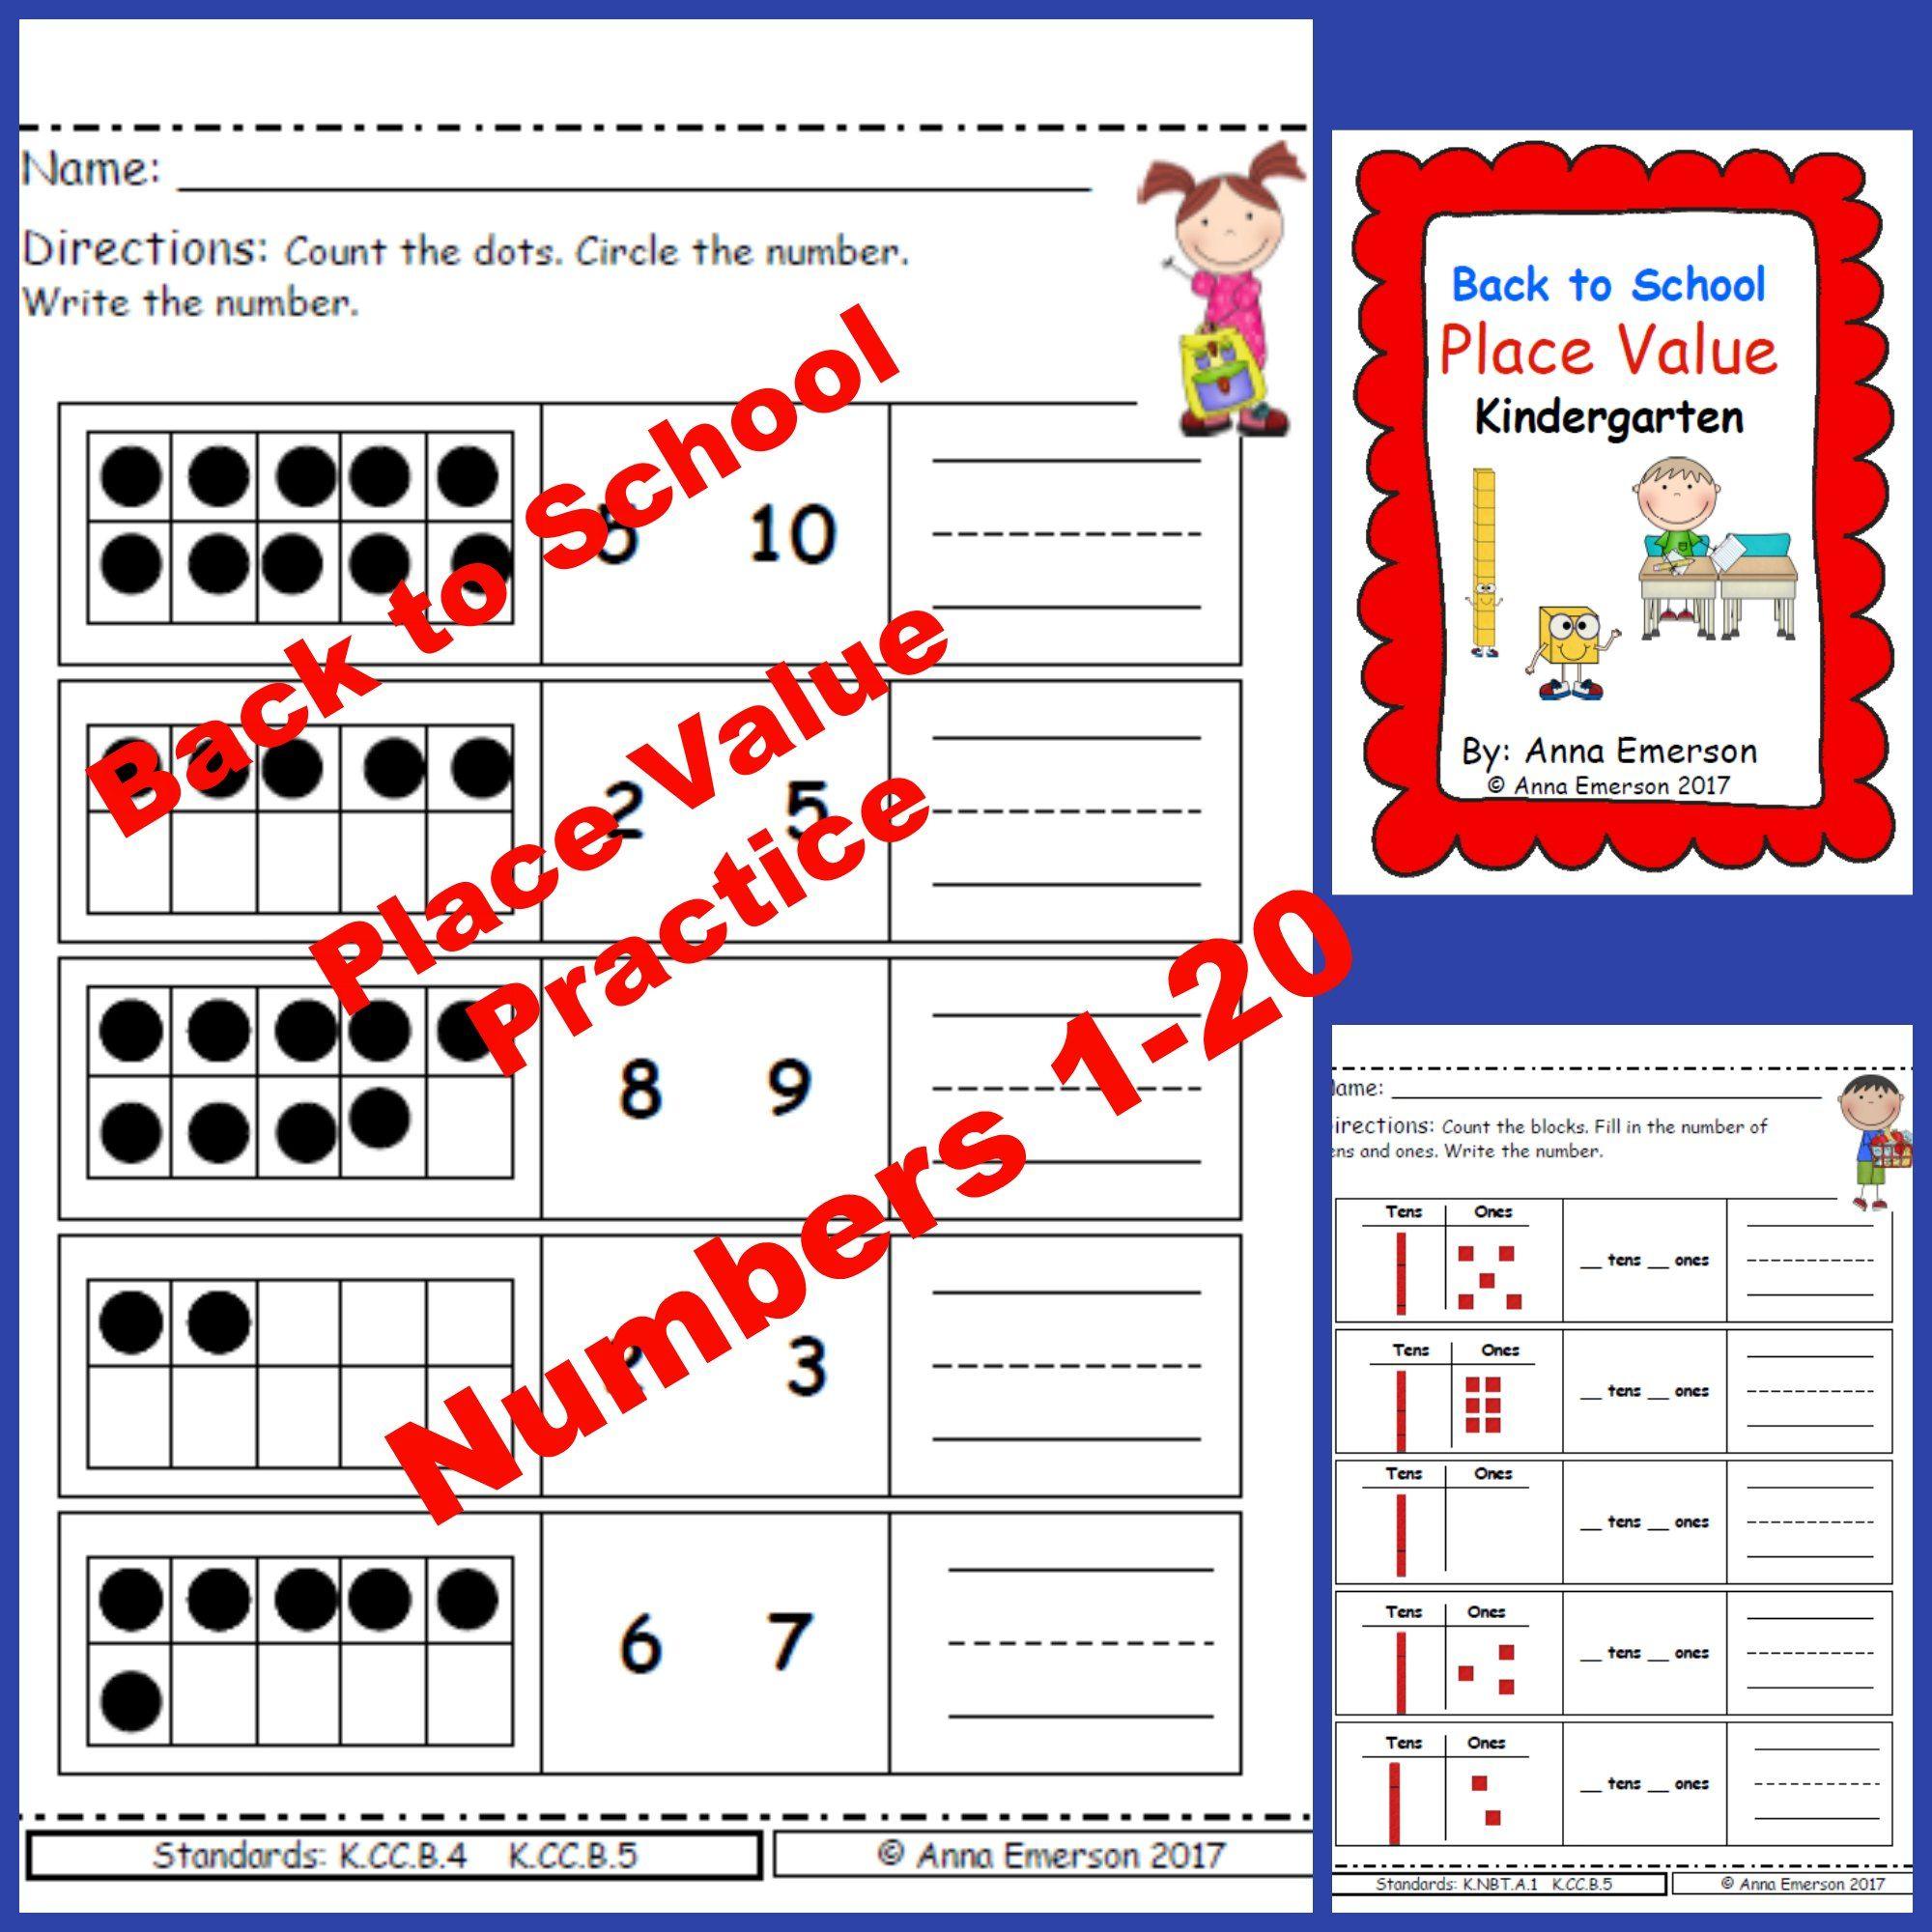 Back To School Place Value Kindergarten